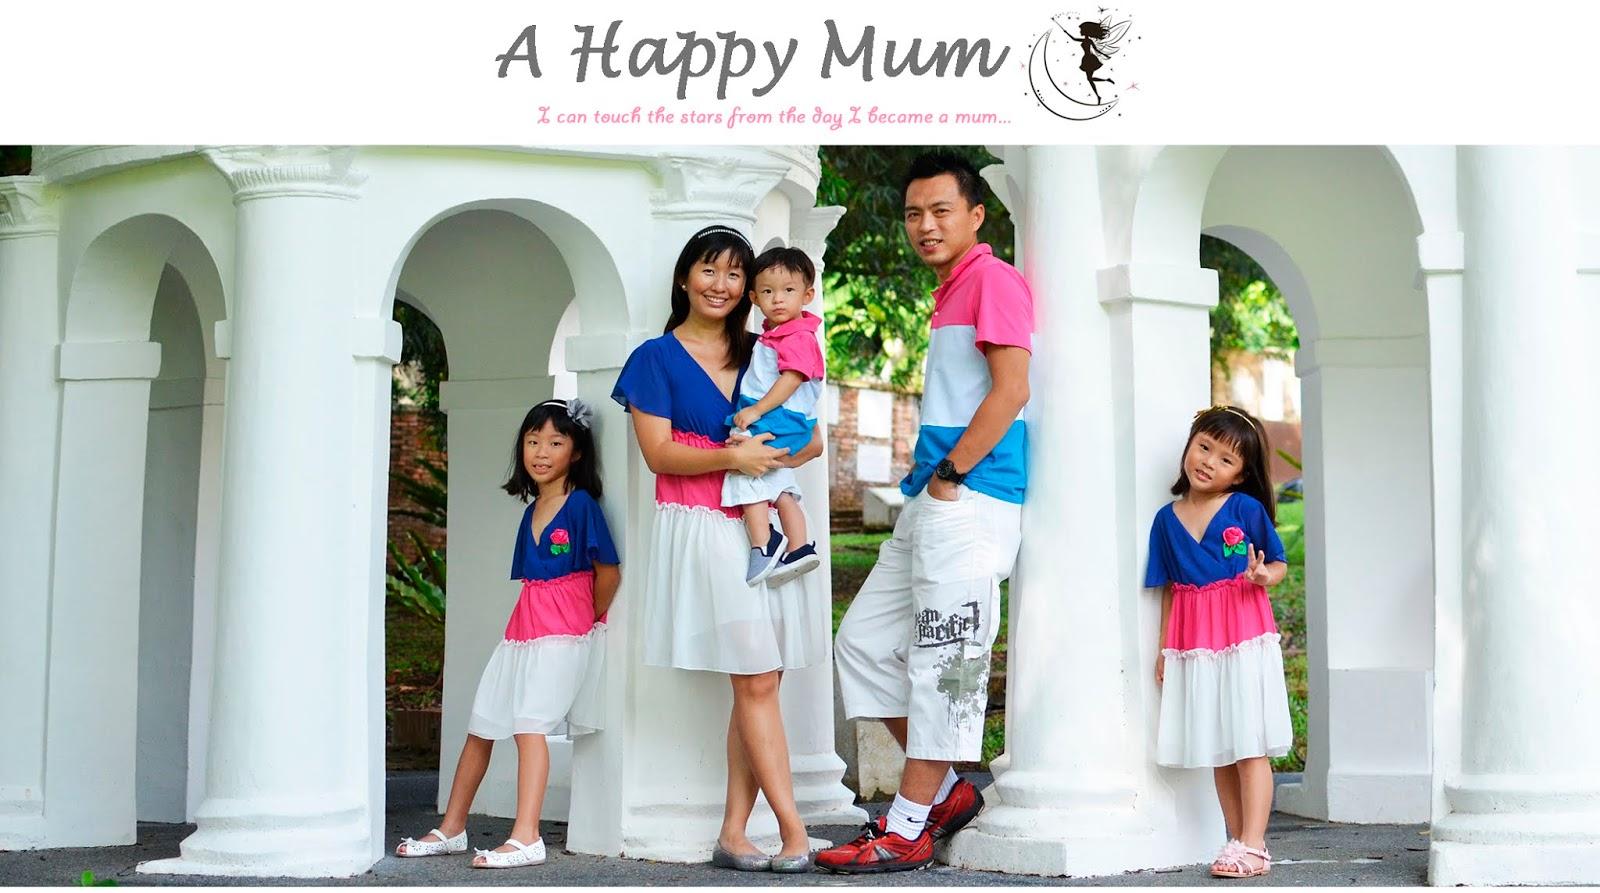 A Happy Mum